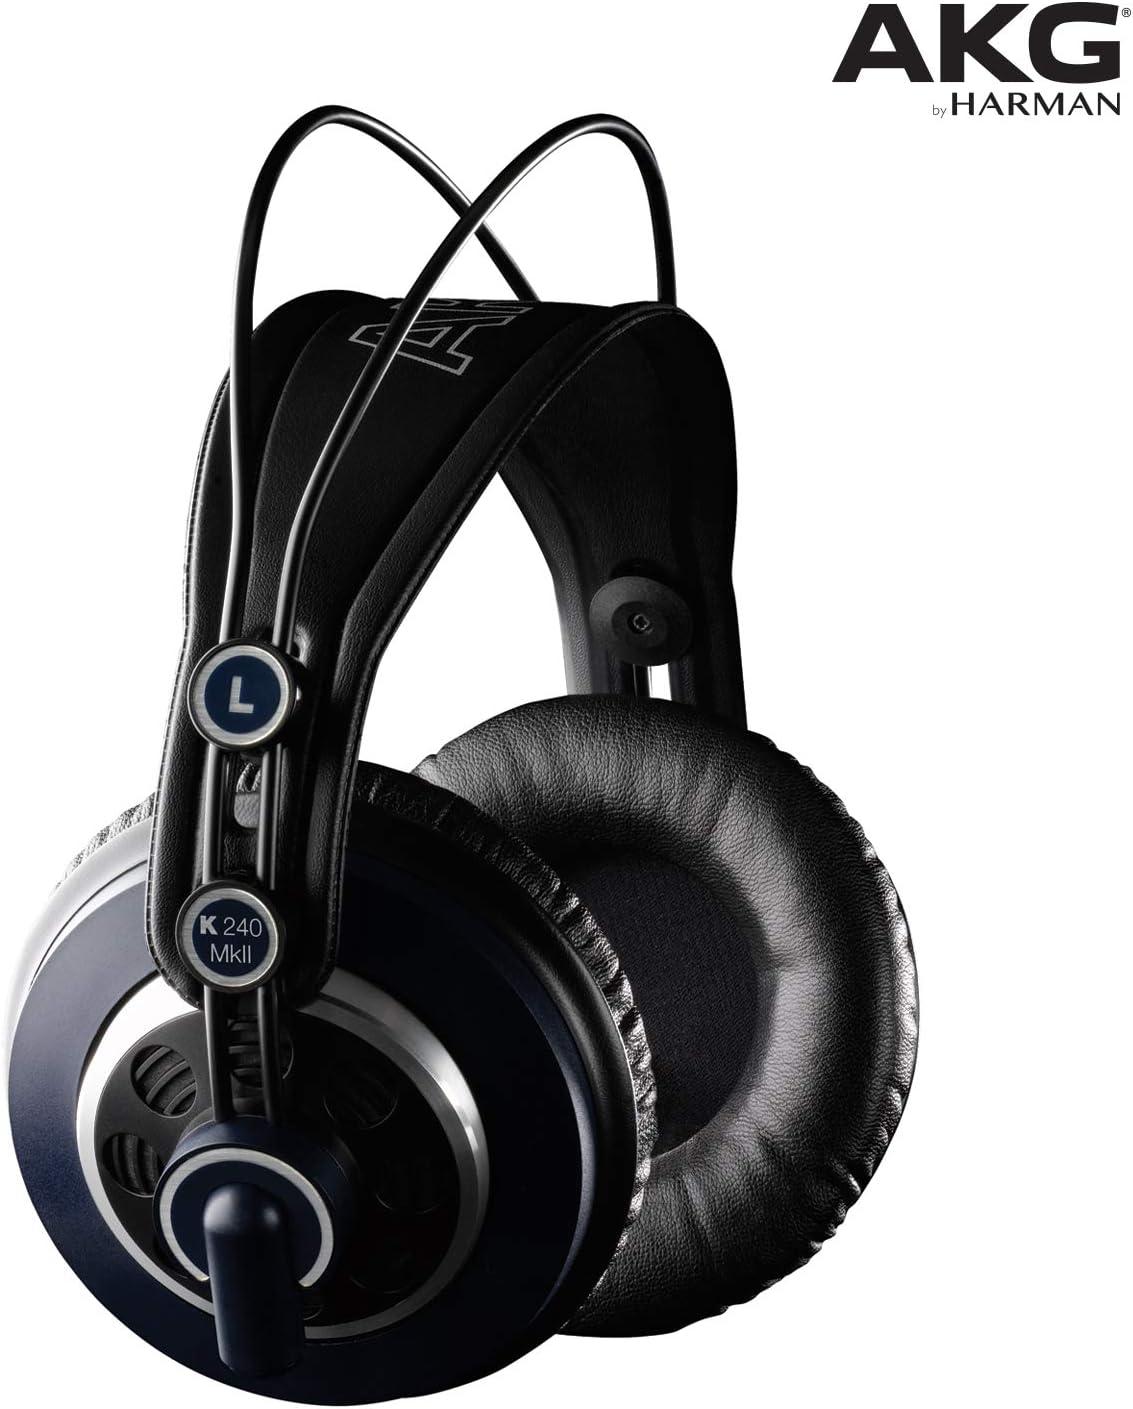 Akg 240 mk auriculares